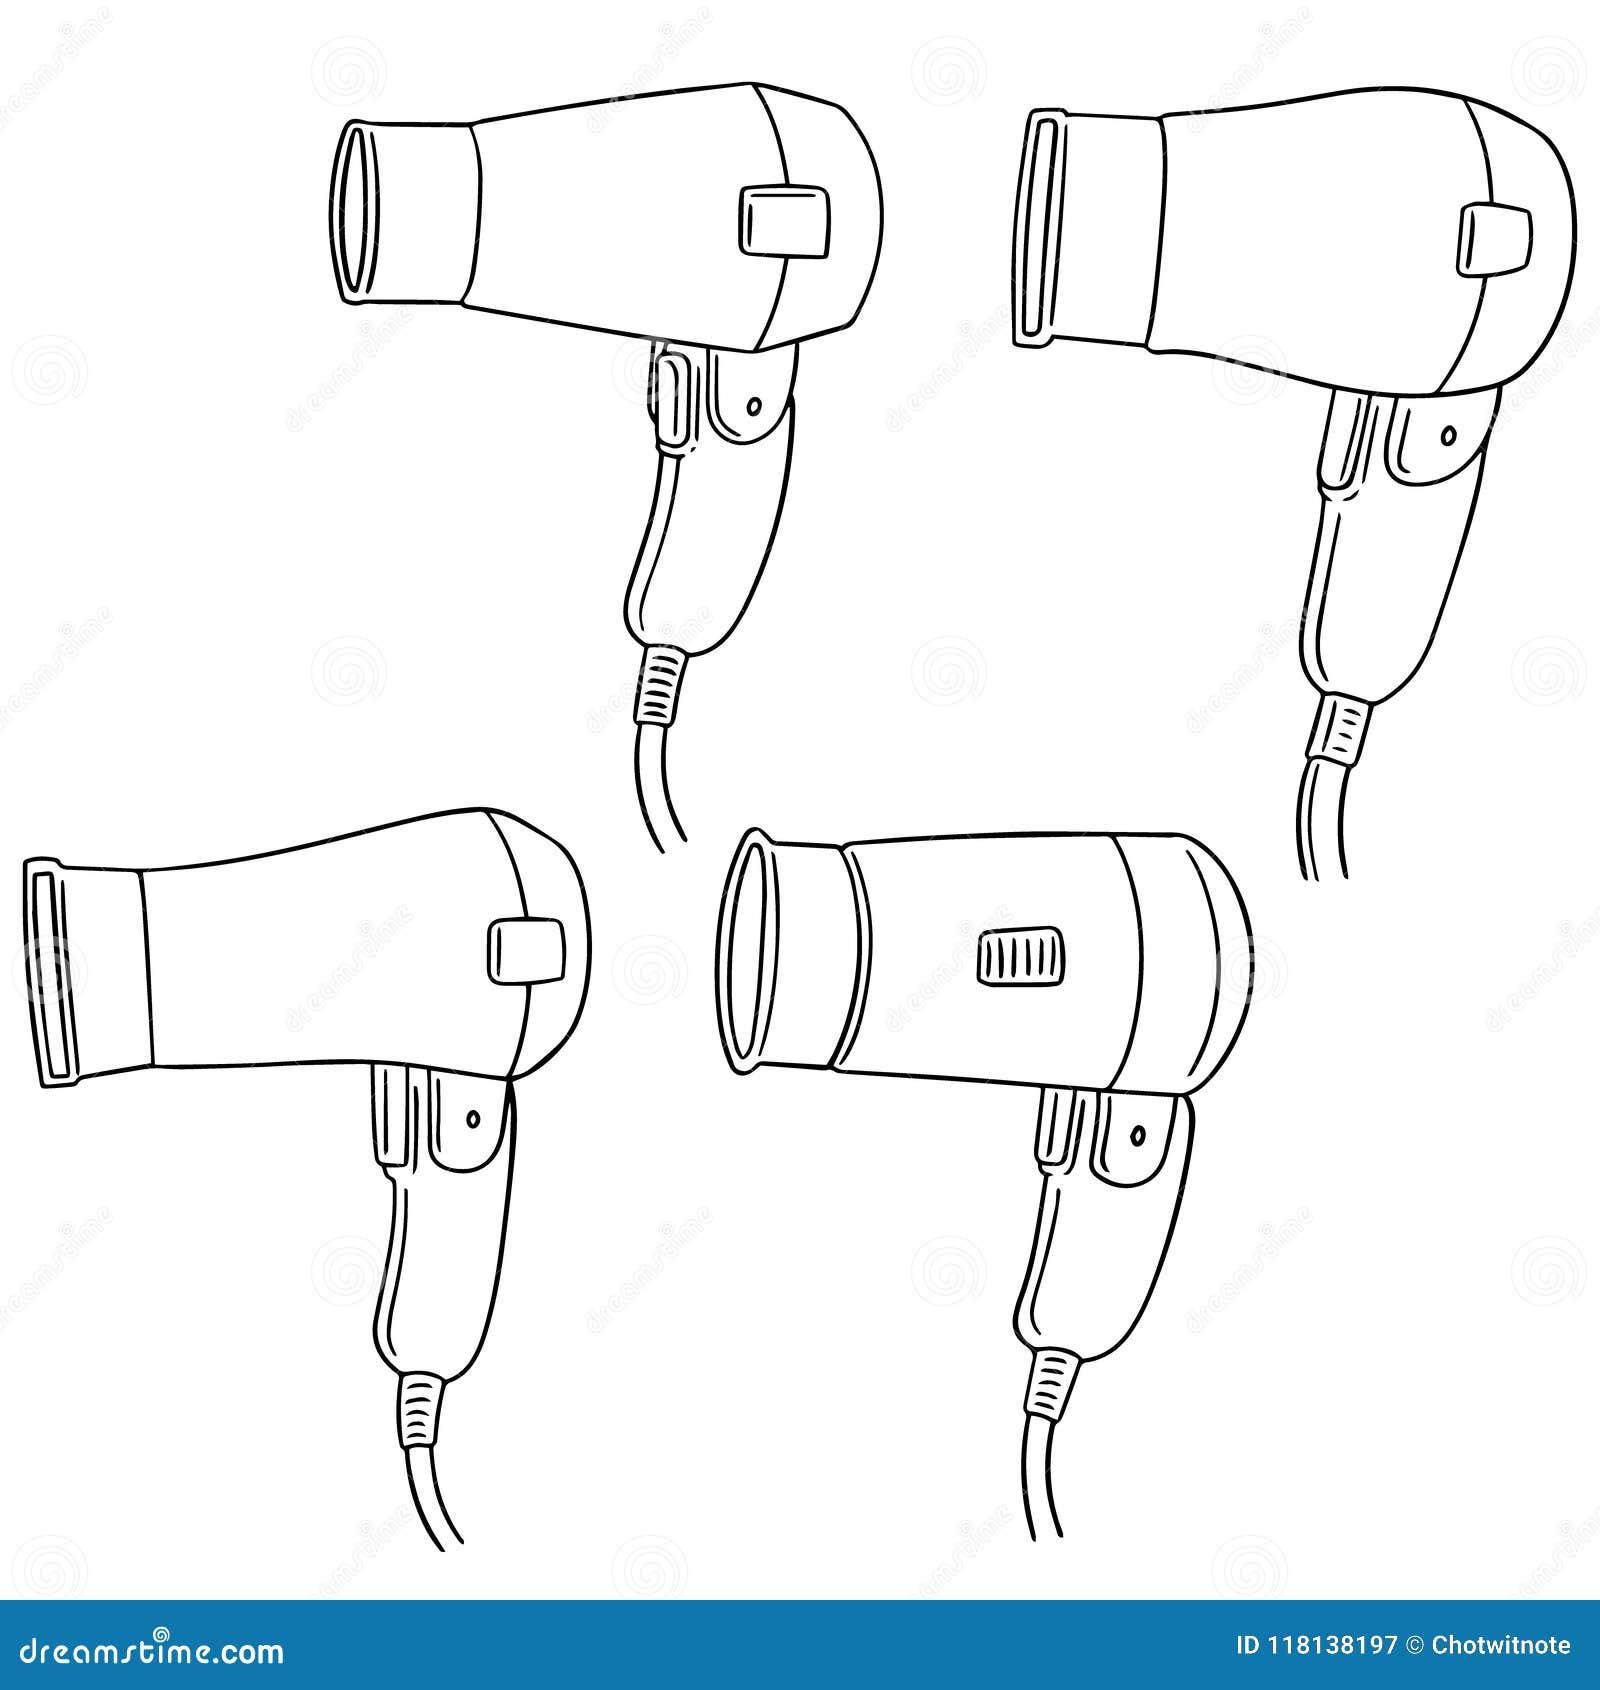 Vector Set Of Hair Dryer Stock Vector Illustration Of Heat 118138197